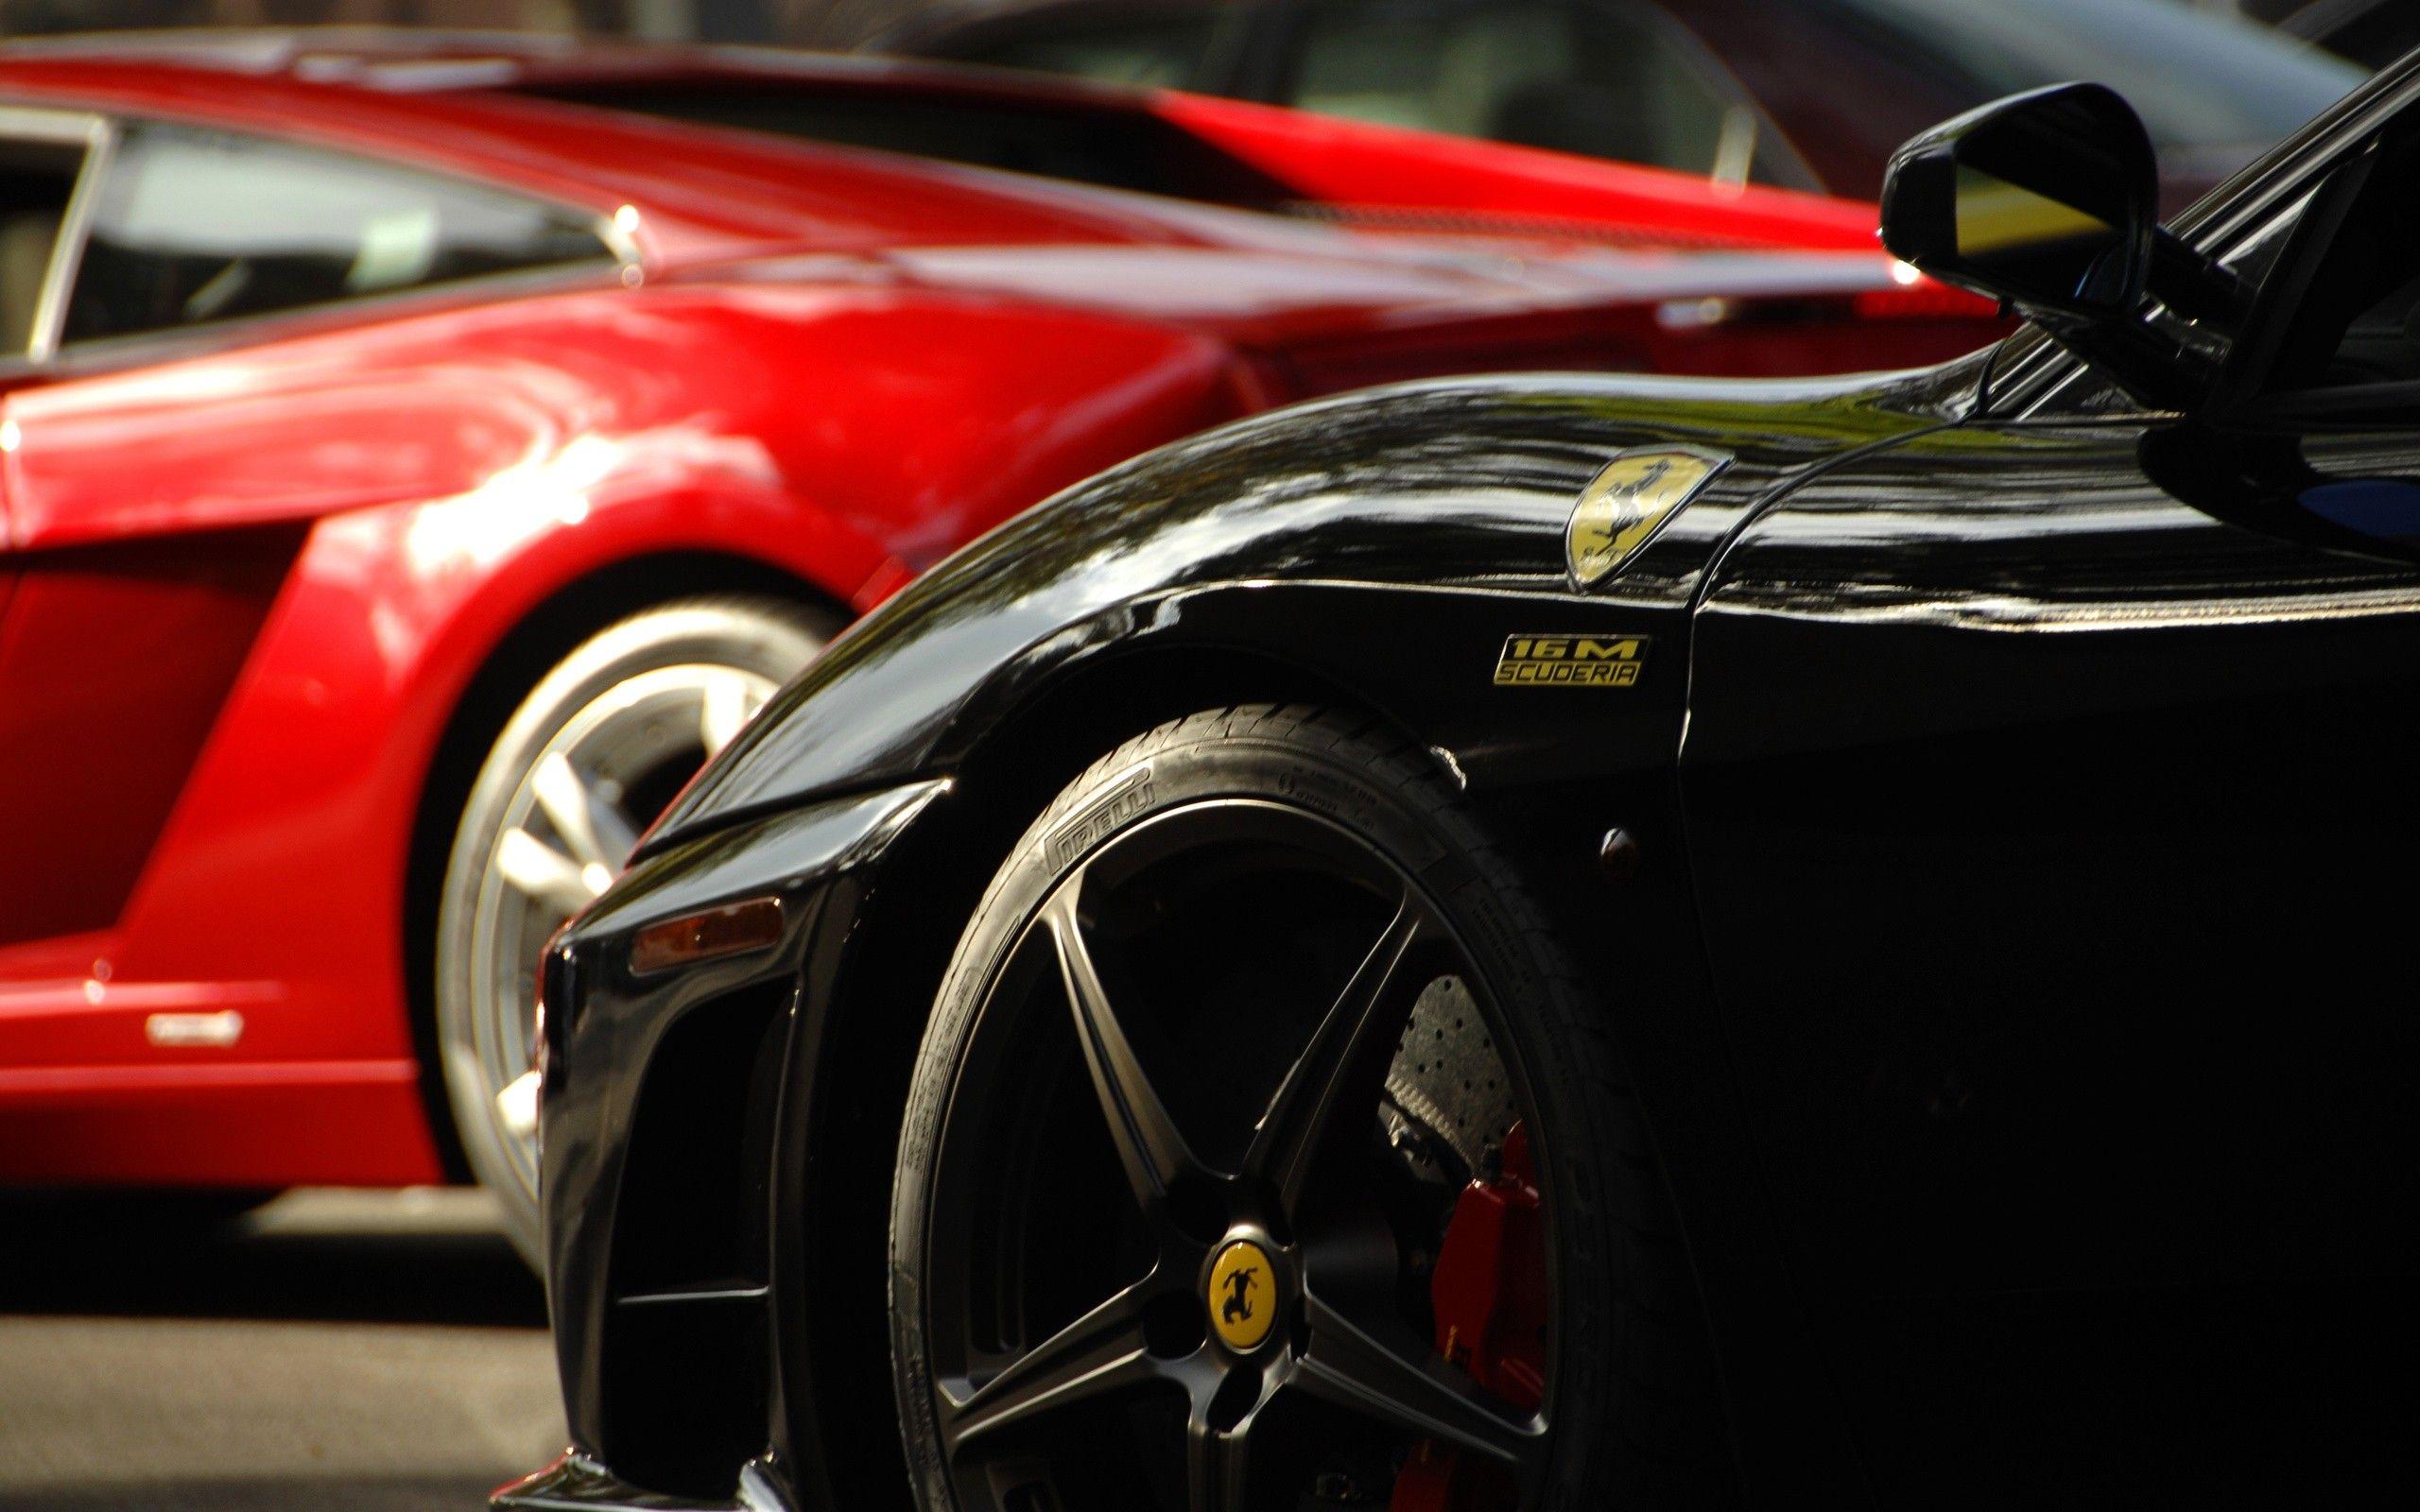 turbo car luxury ferrari rent porsche rome aaa sport hire rental macan